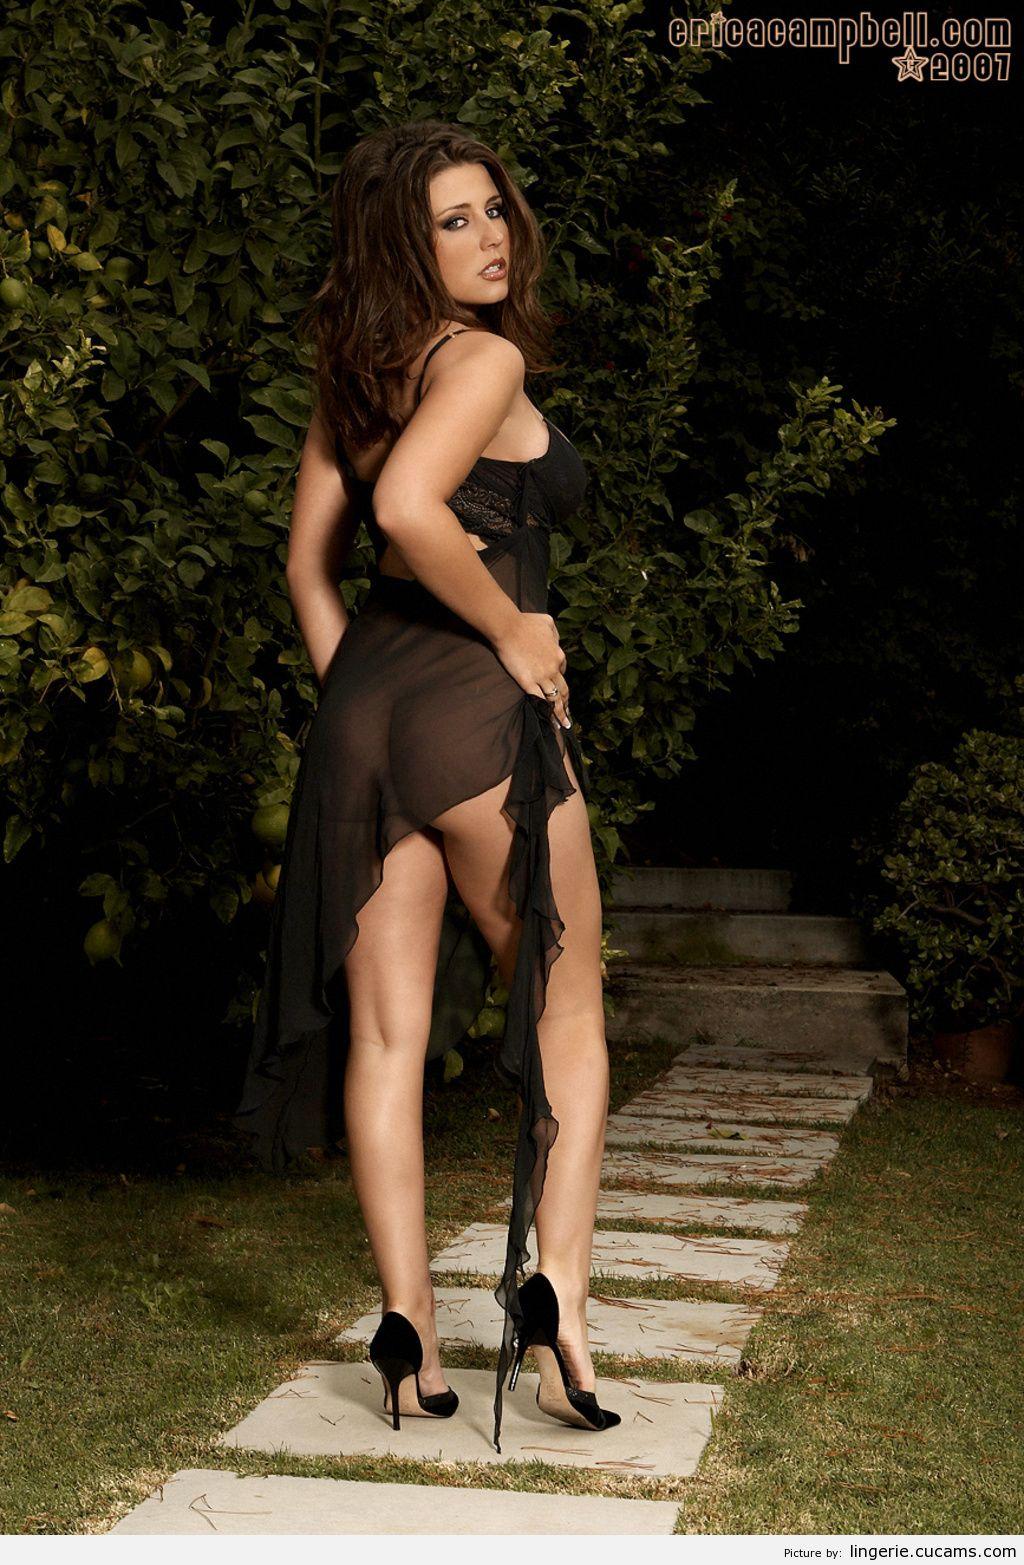 Lingerie Maid Heels by lingerie.cucams.com